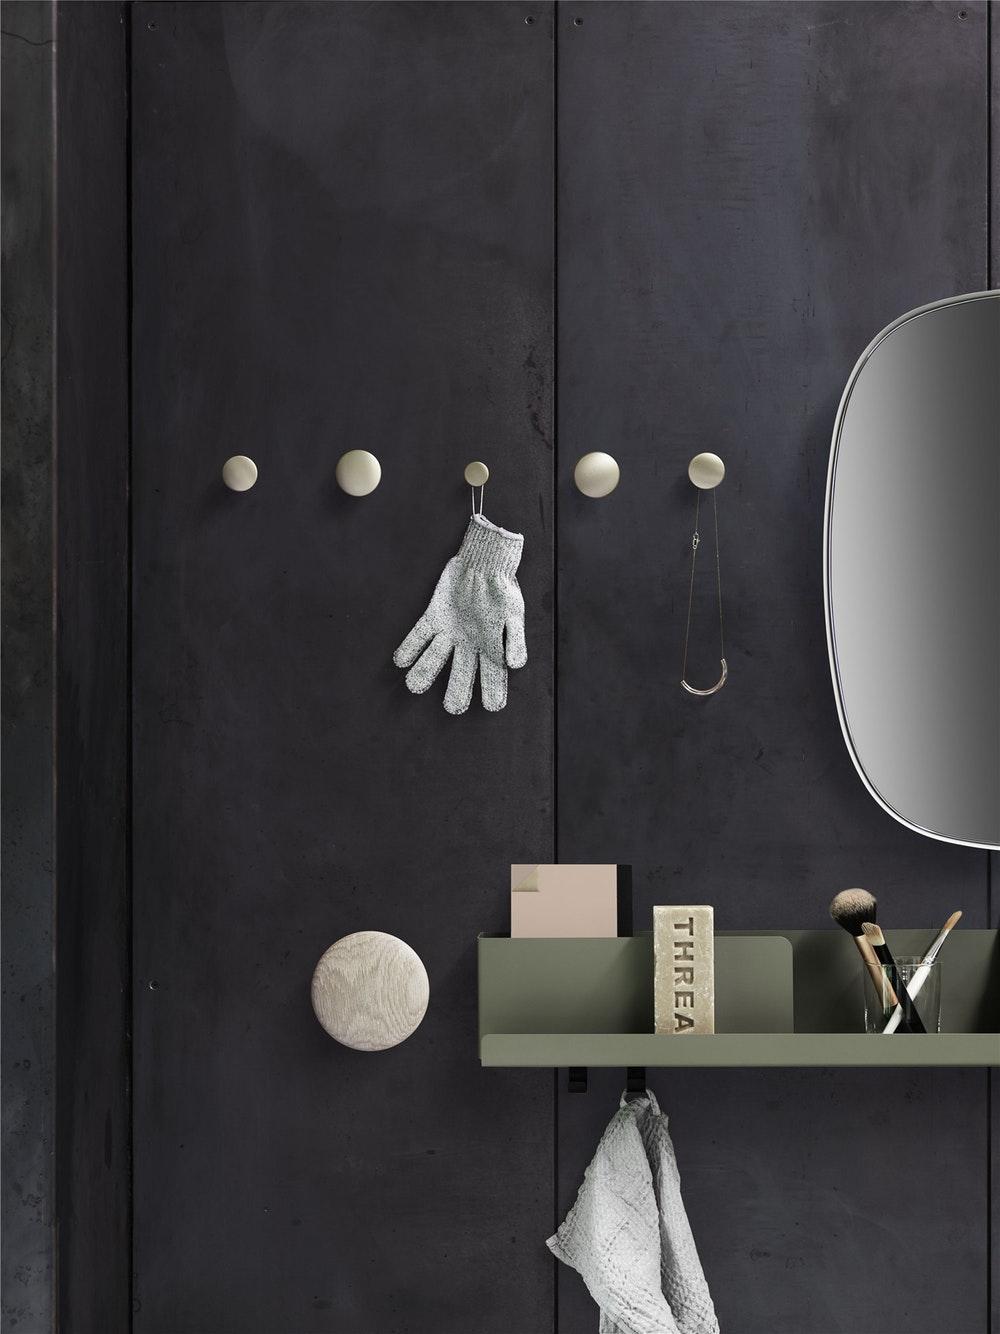 the-dots-metal-framed-folded-bathroom-1470748659.jpg